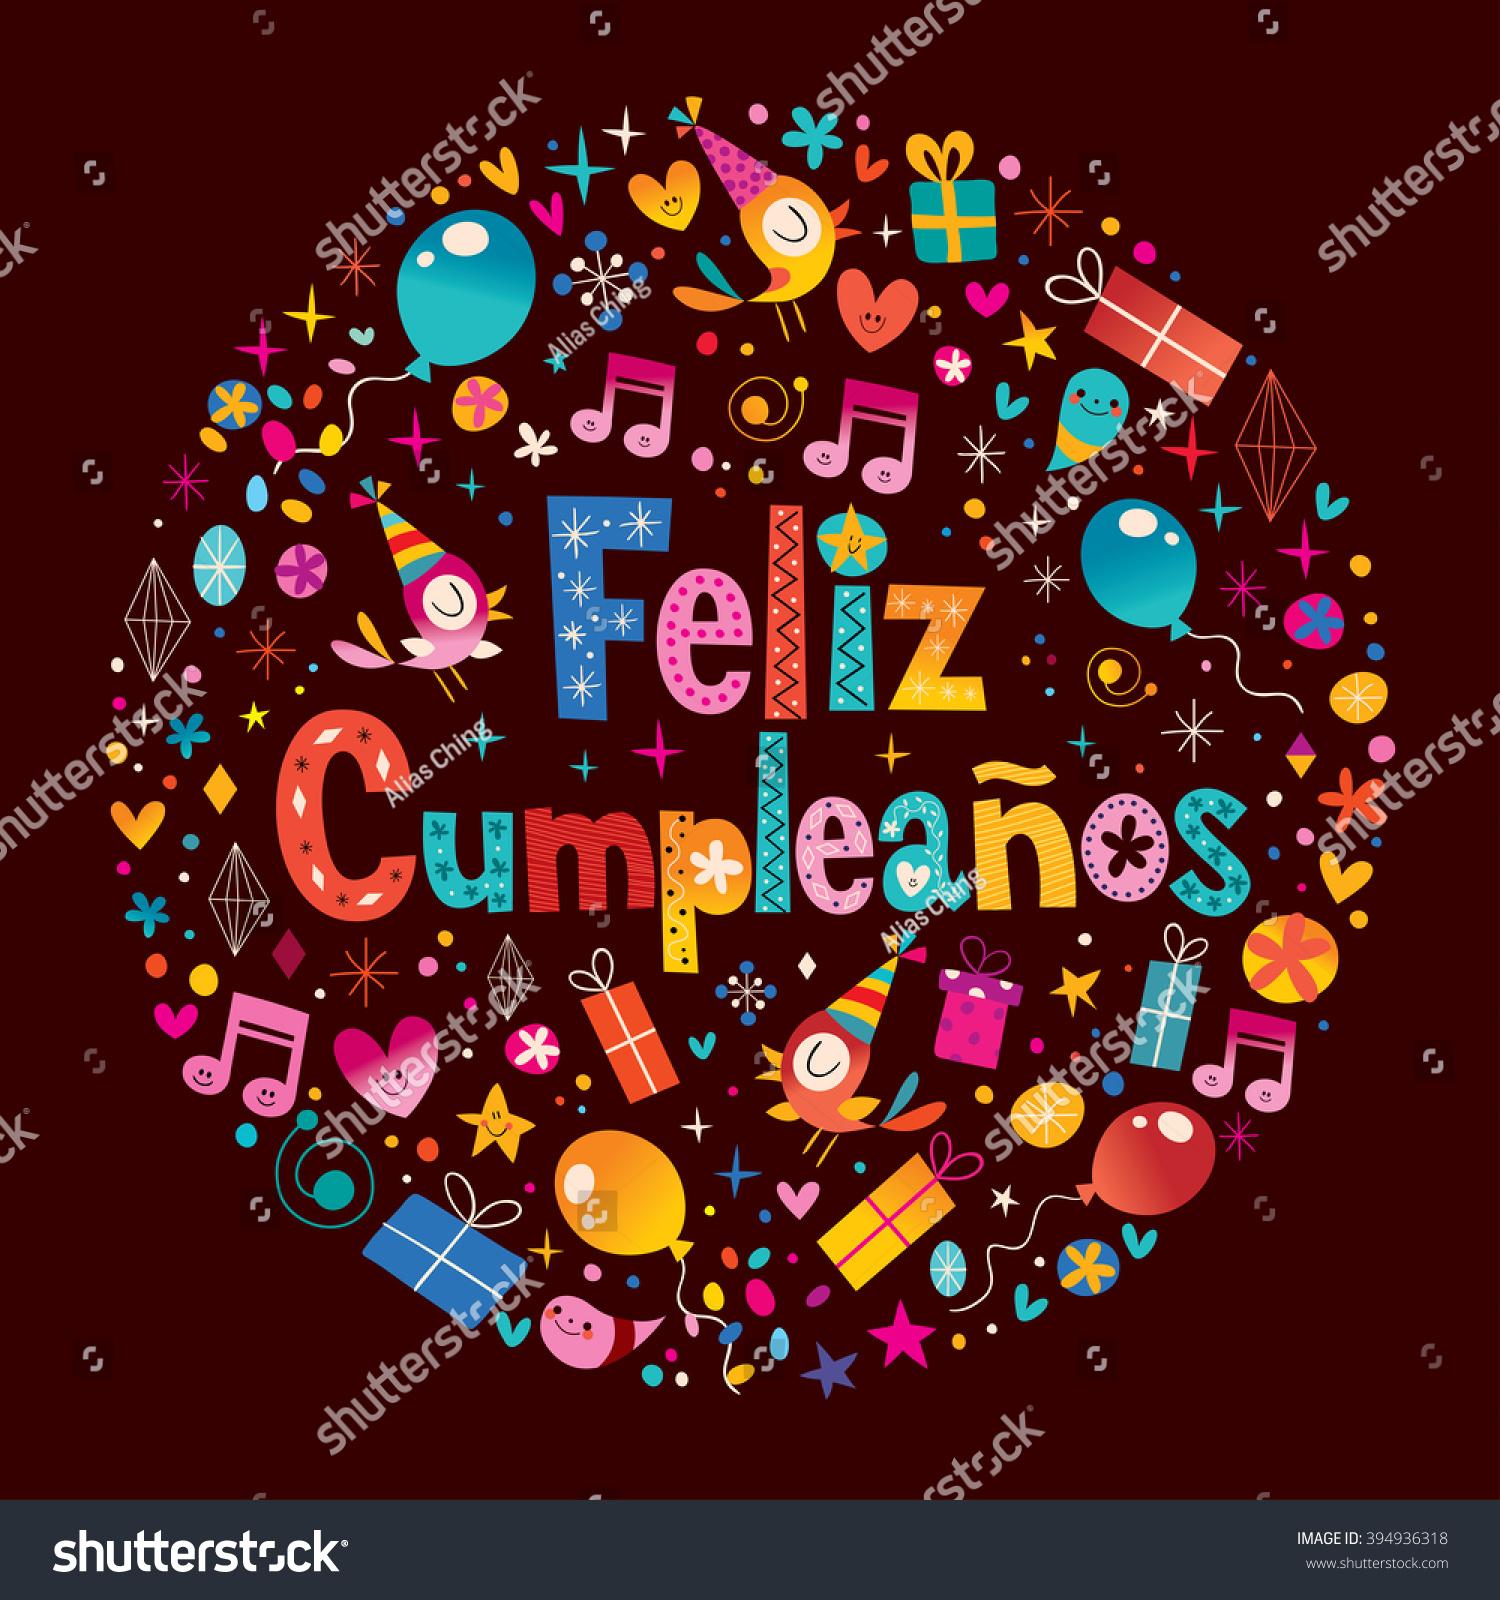 Feliz Cumpleanos Happy Birthday Spanish Greeting Stock Vector